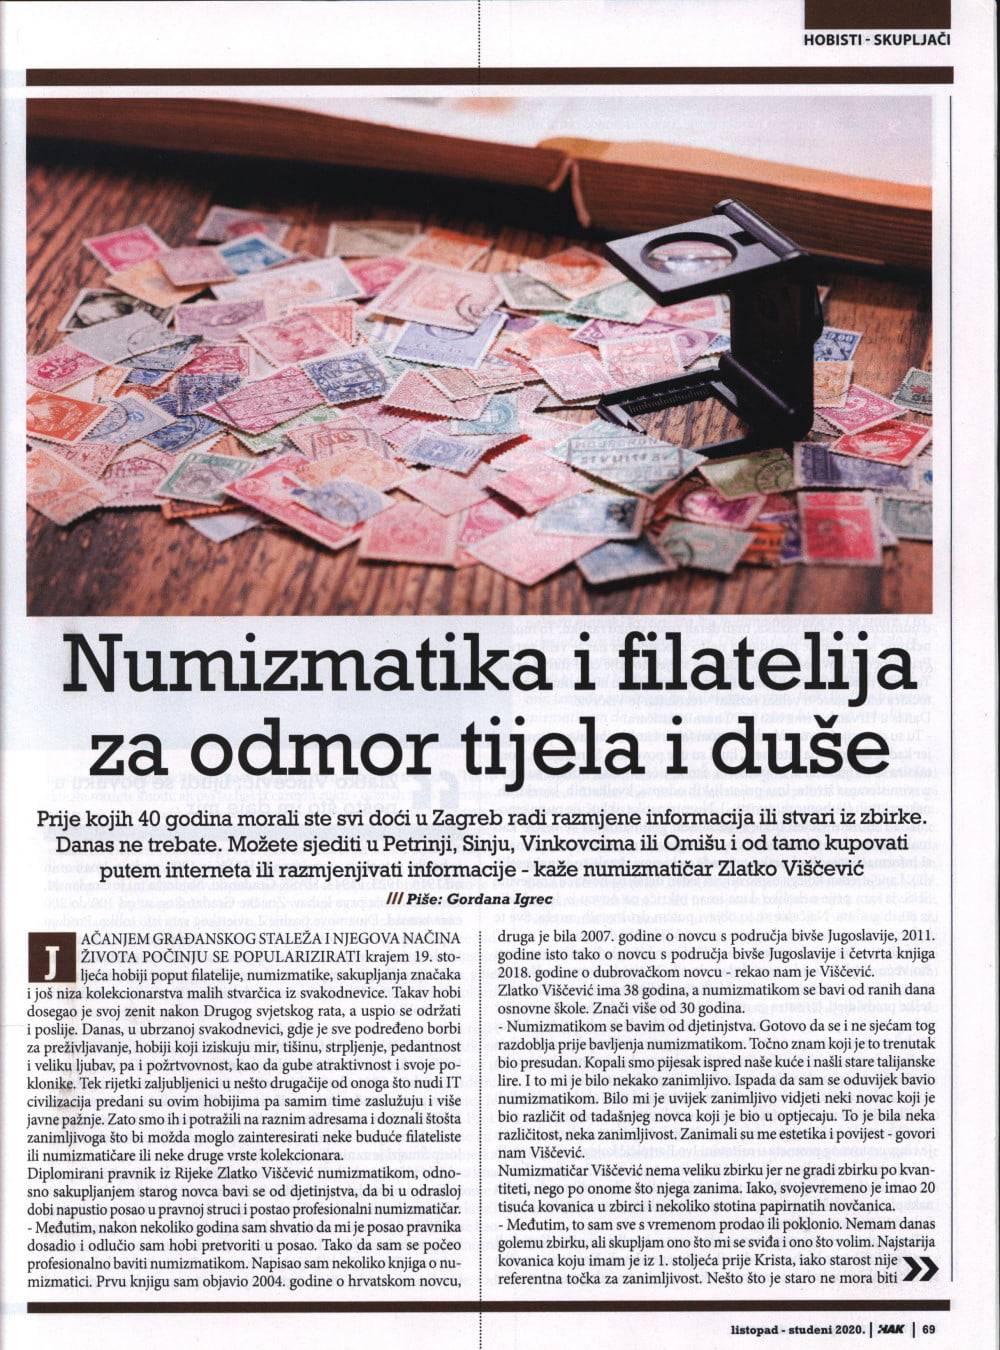 Numizmatika i filatelija - Revija HAK (1)